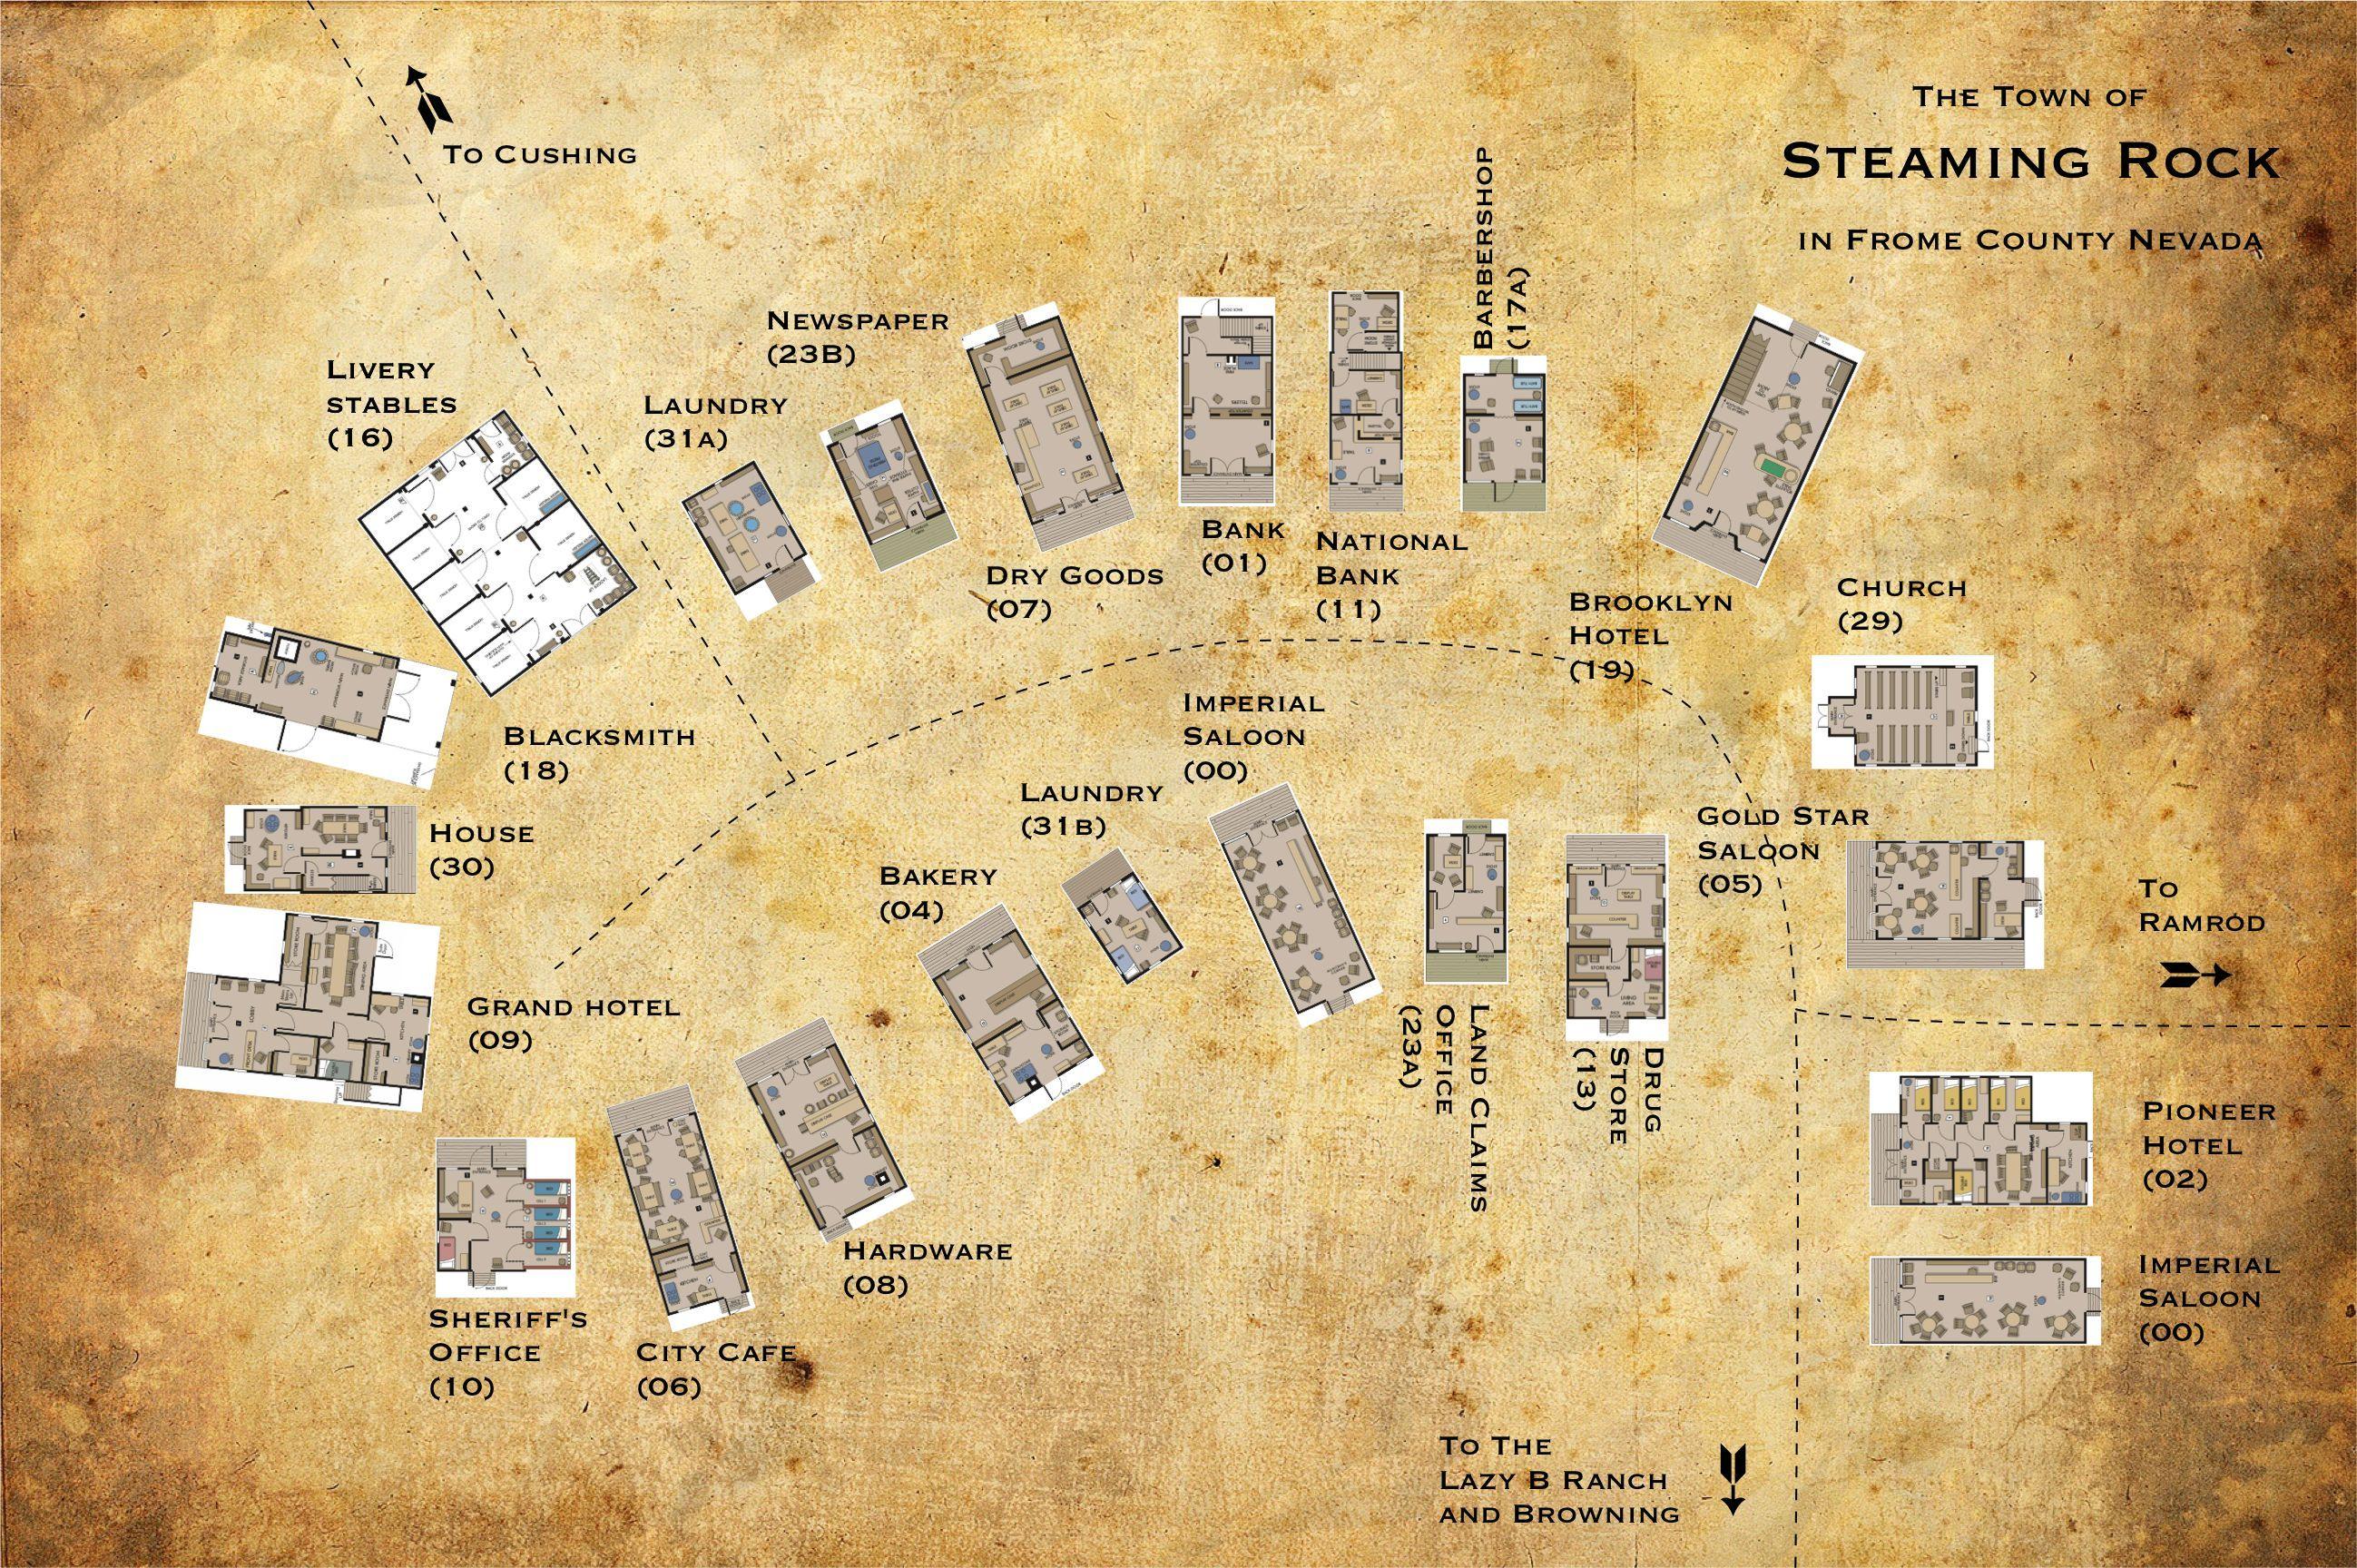 wild west town plan - Поиск в Google